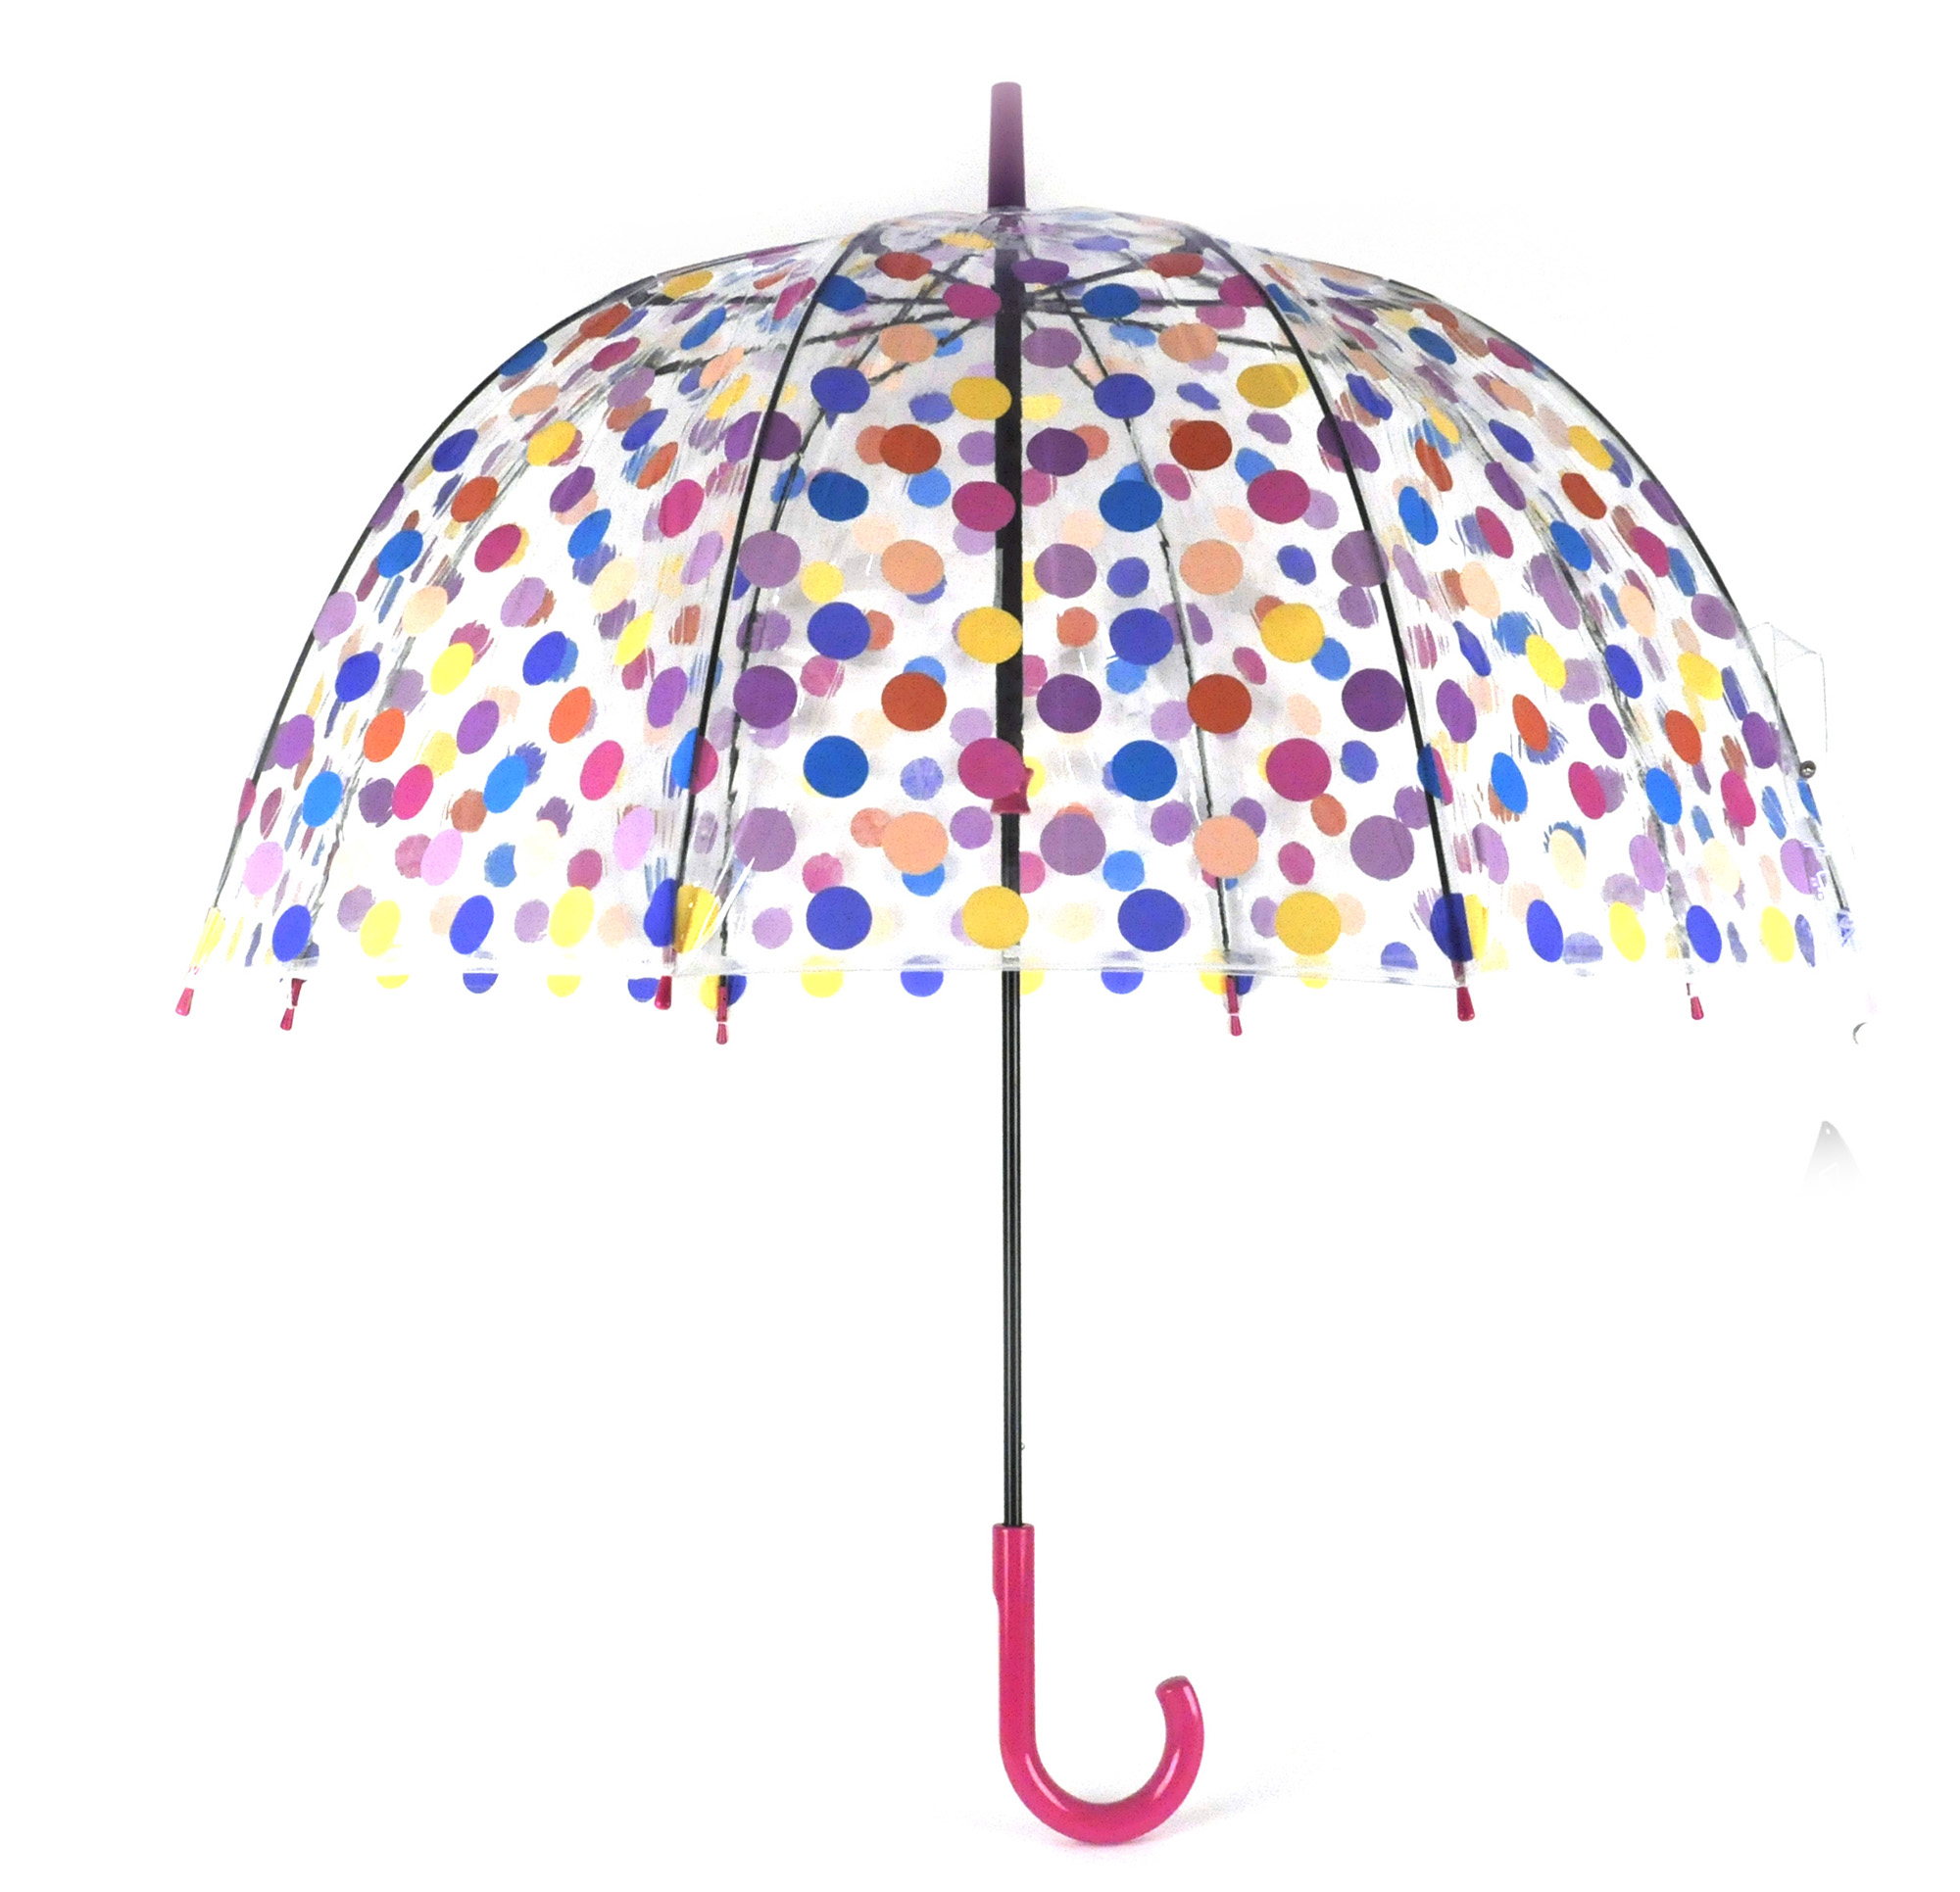 Spotty Birdcage Full Dome Umbrella Transparent Pink